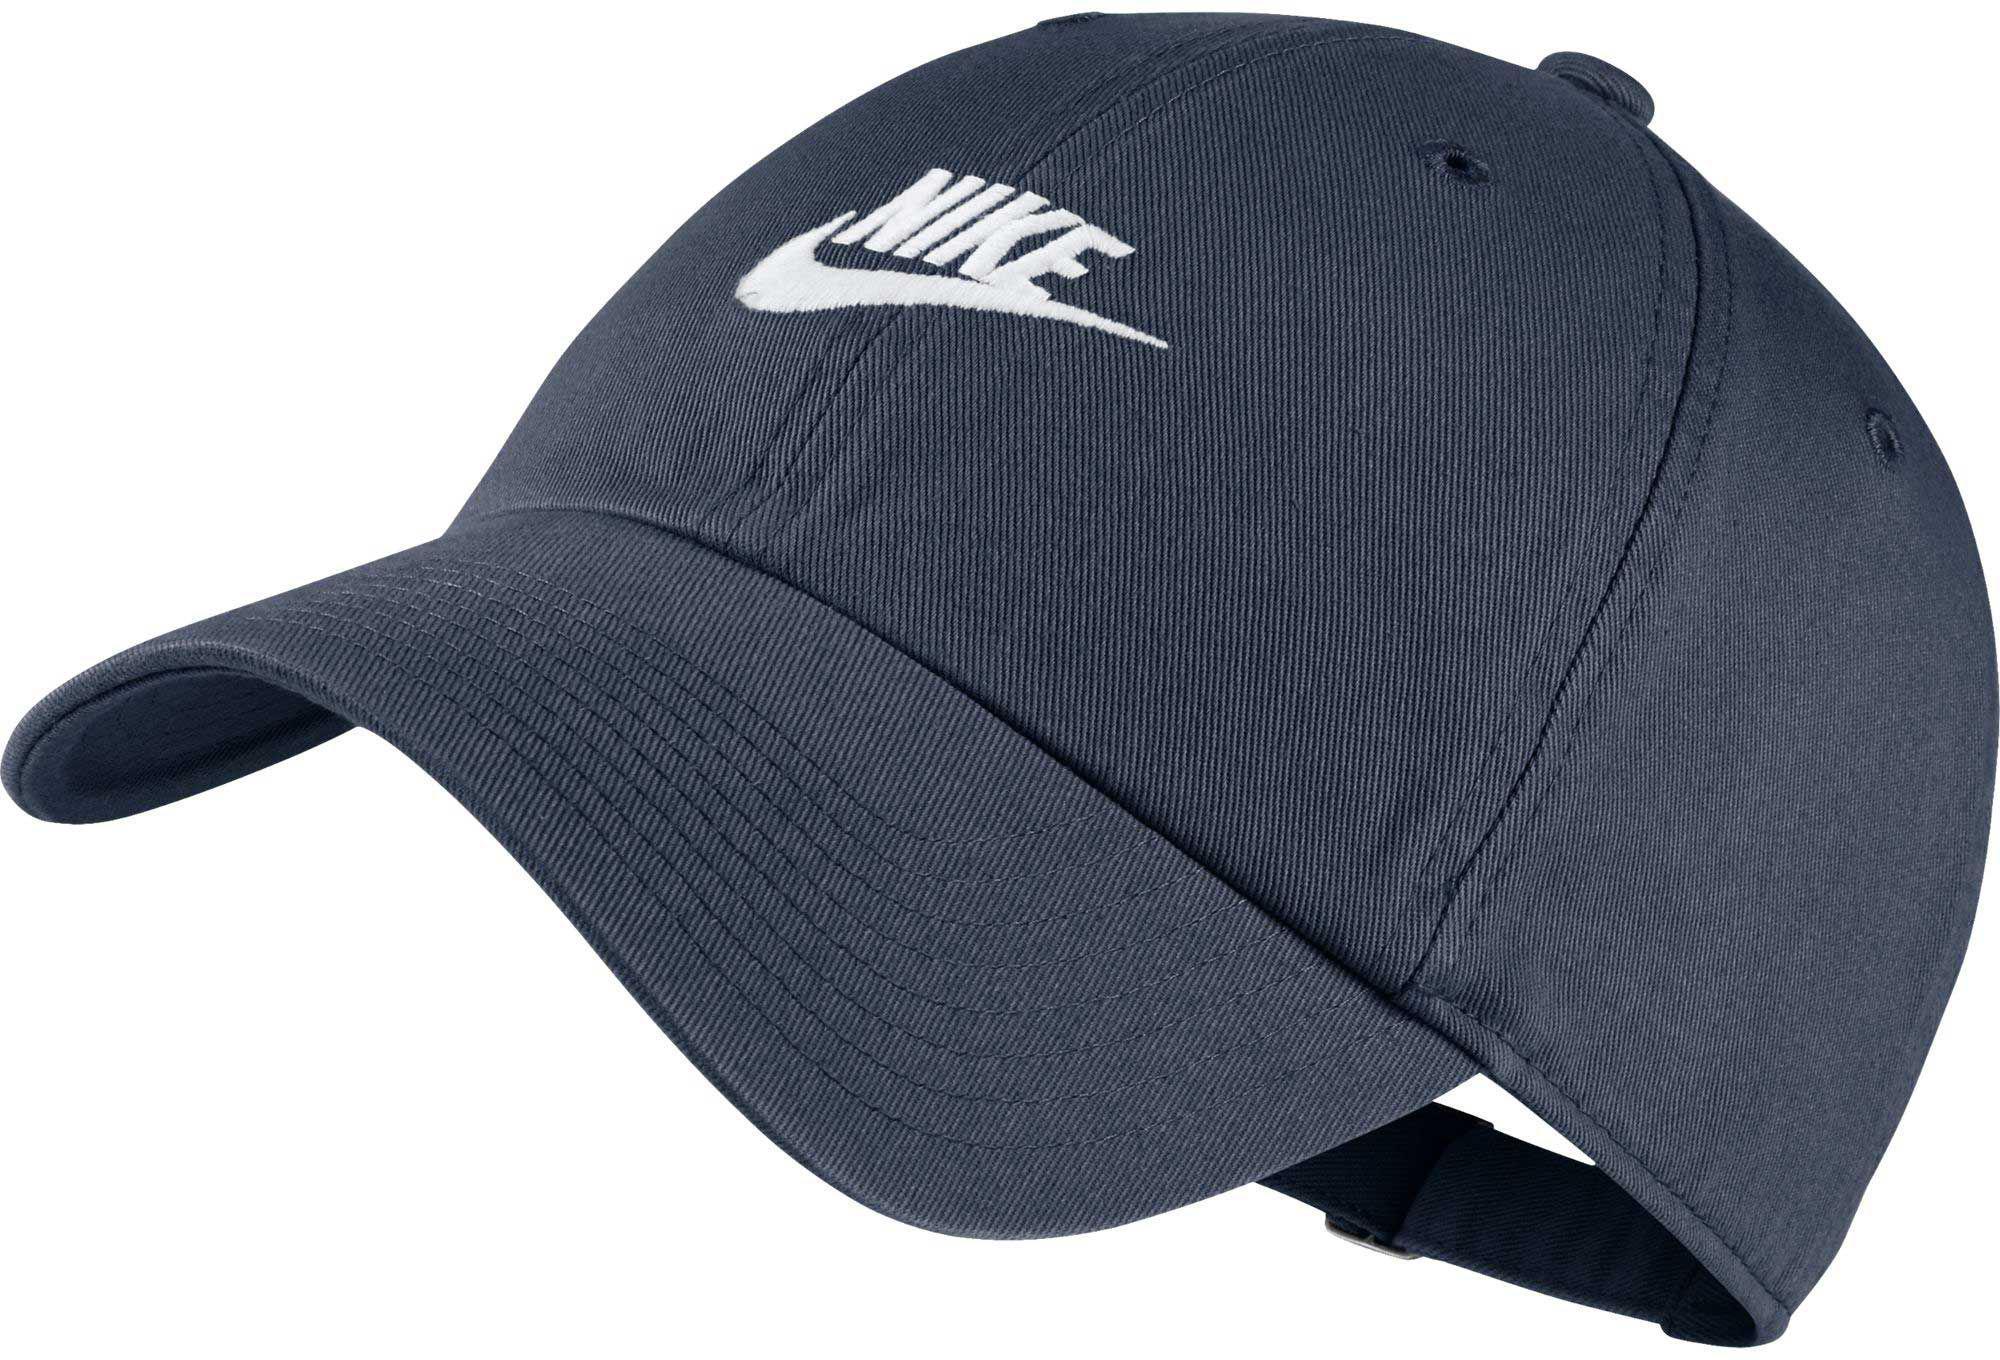 d23a3f98079 Lyst - Nike Sportswear H86 Cotton Twill Adjustable Hat in Blue for Men